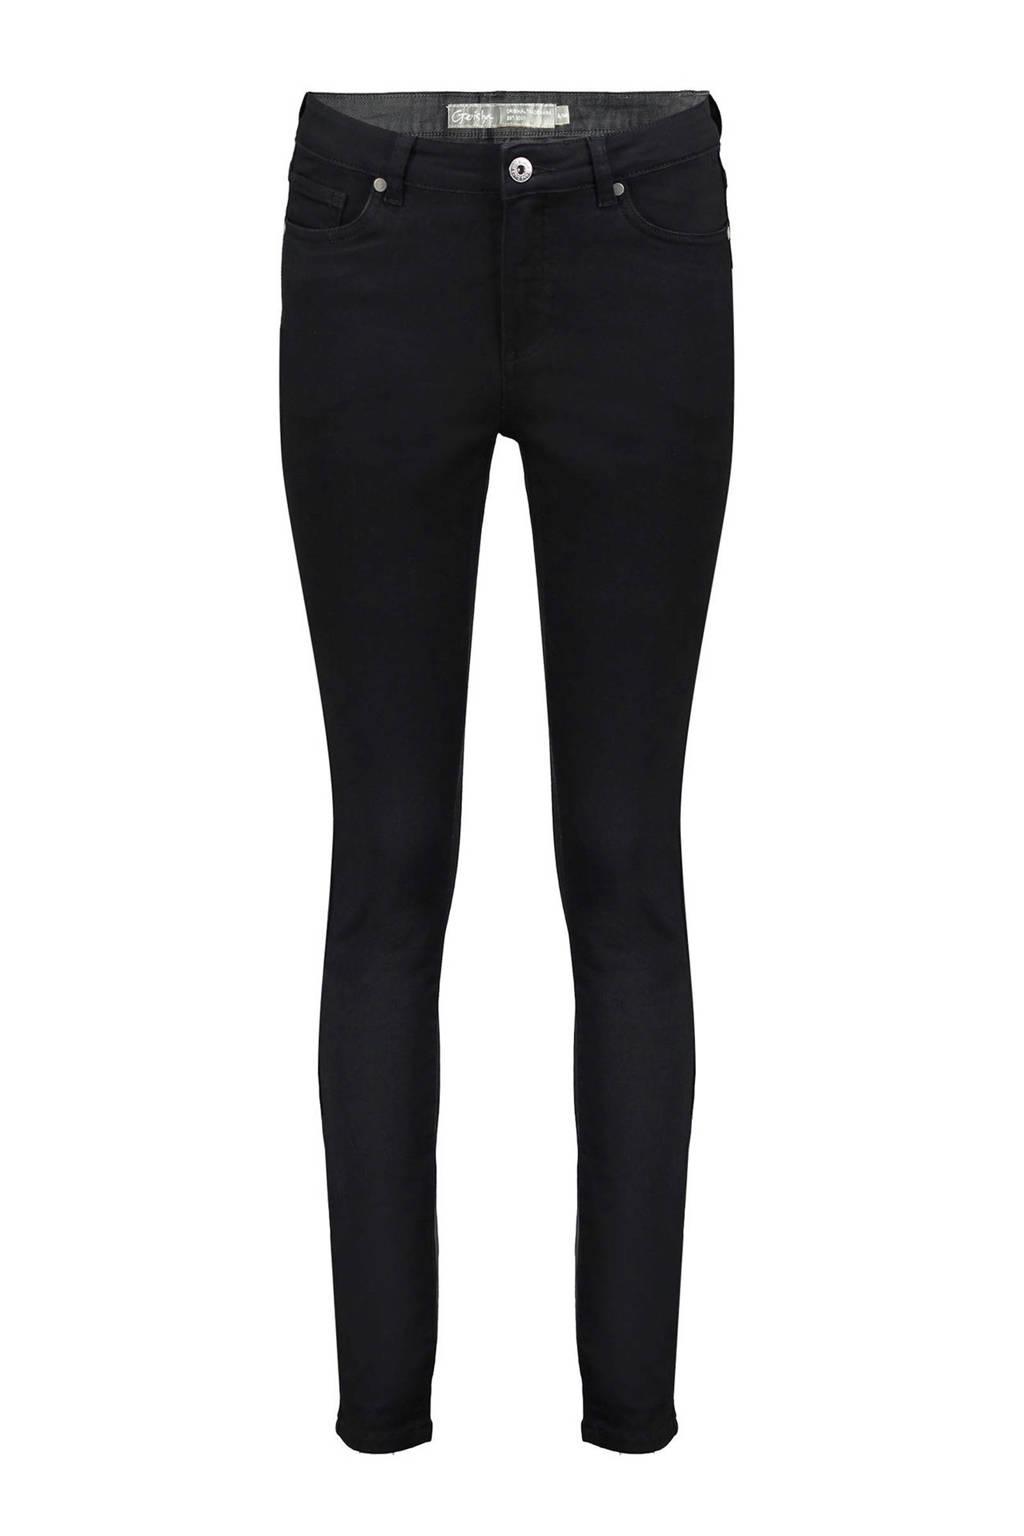 Geisha high waist skinny broek zwart, Zwart